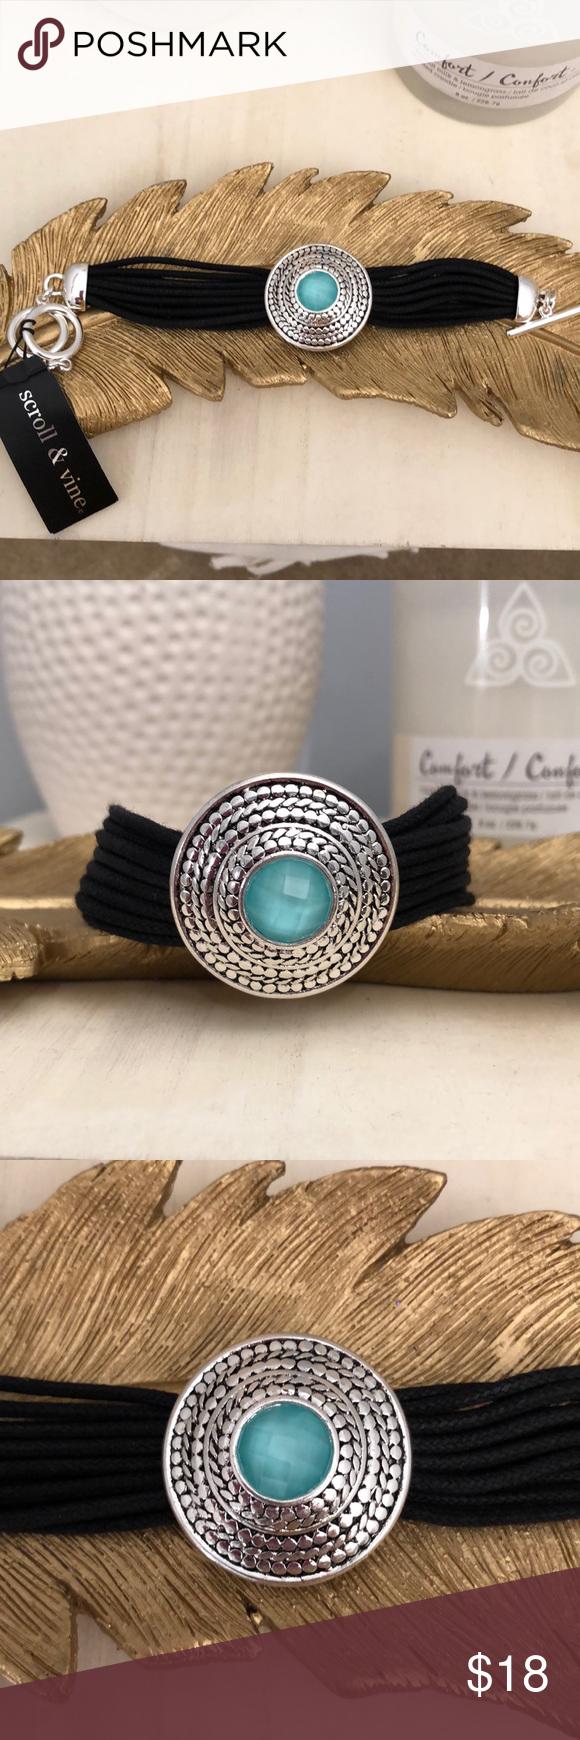 34++ Scroll and vine jewelry bracelet viral